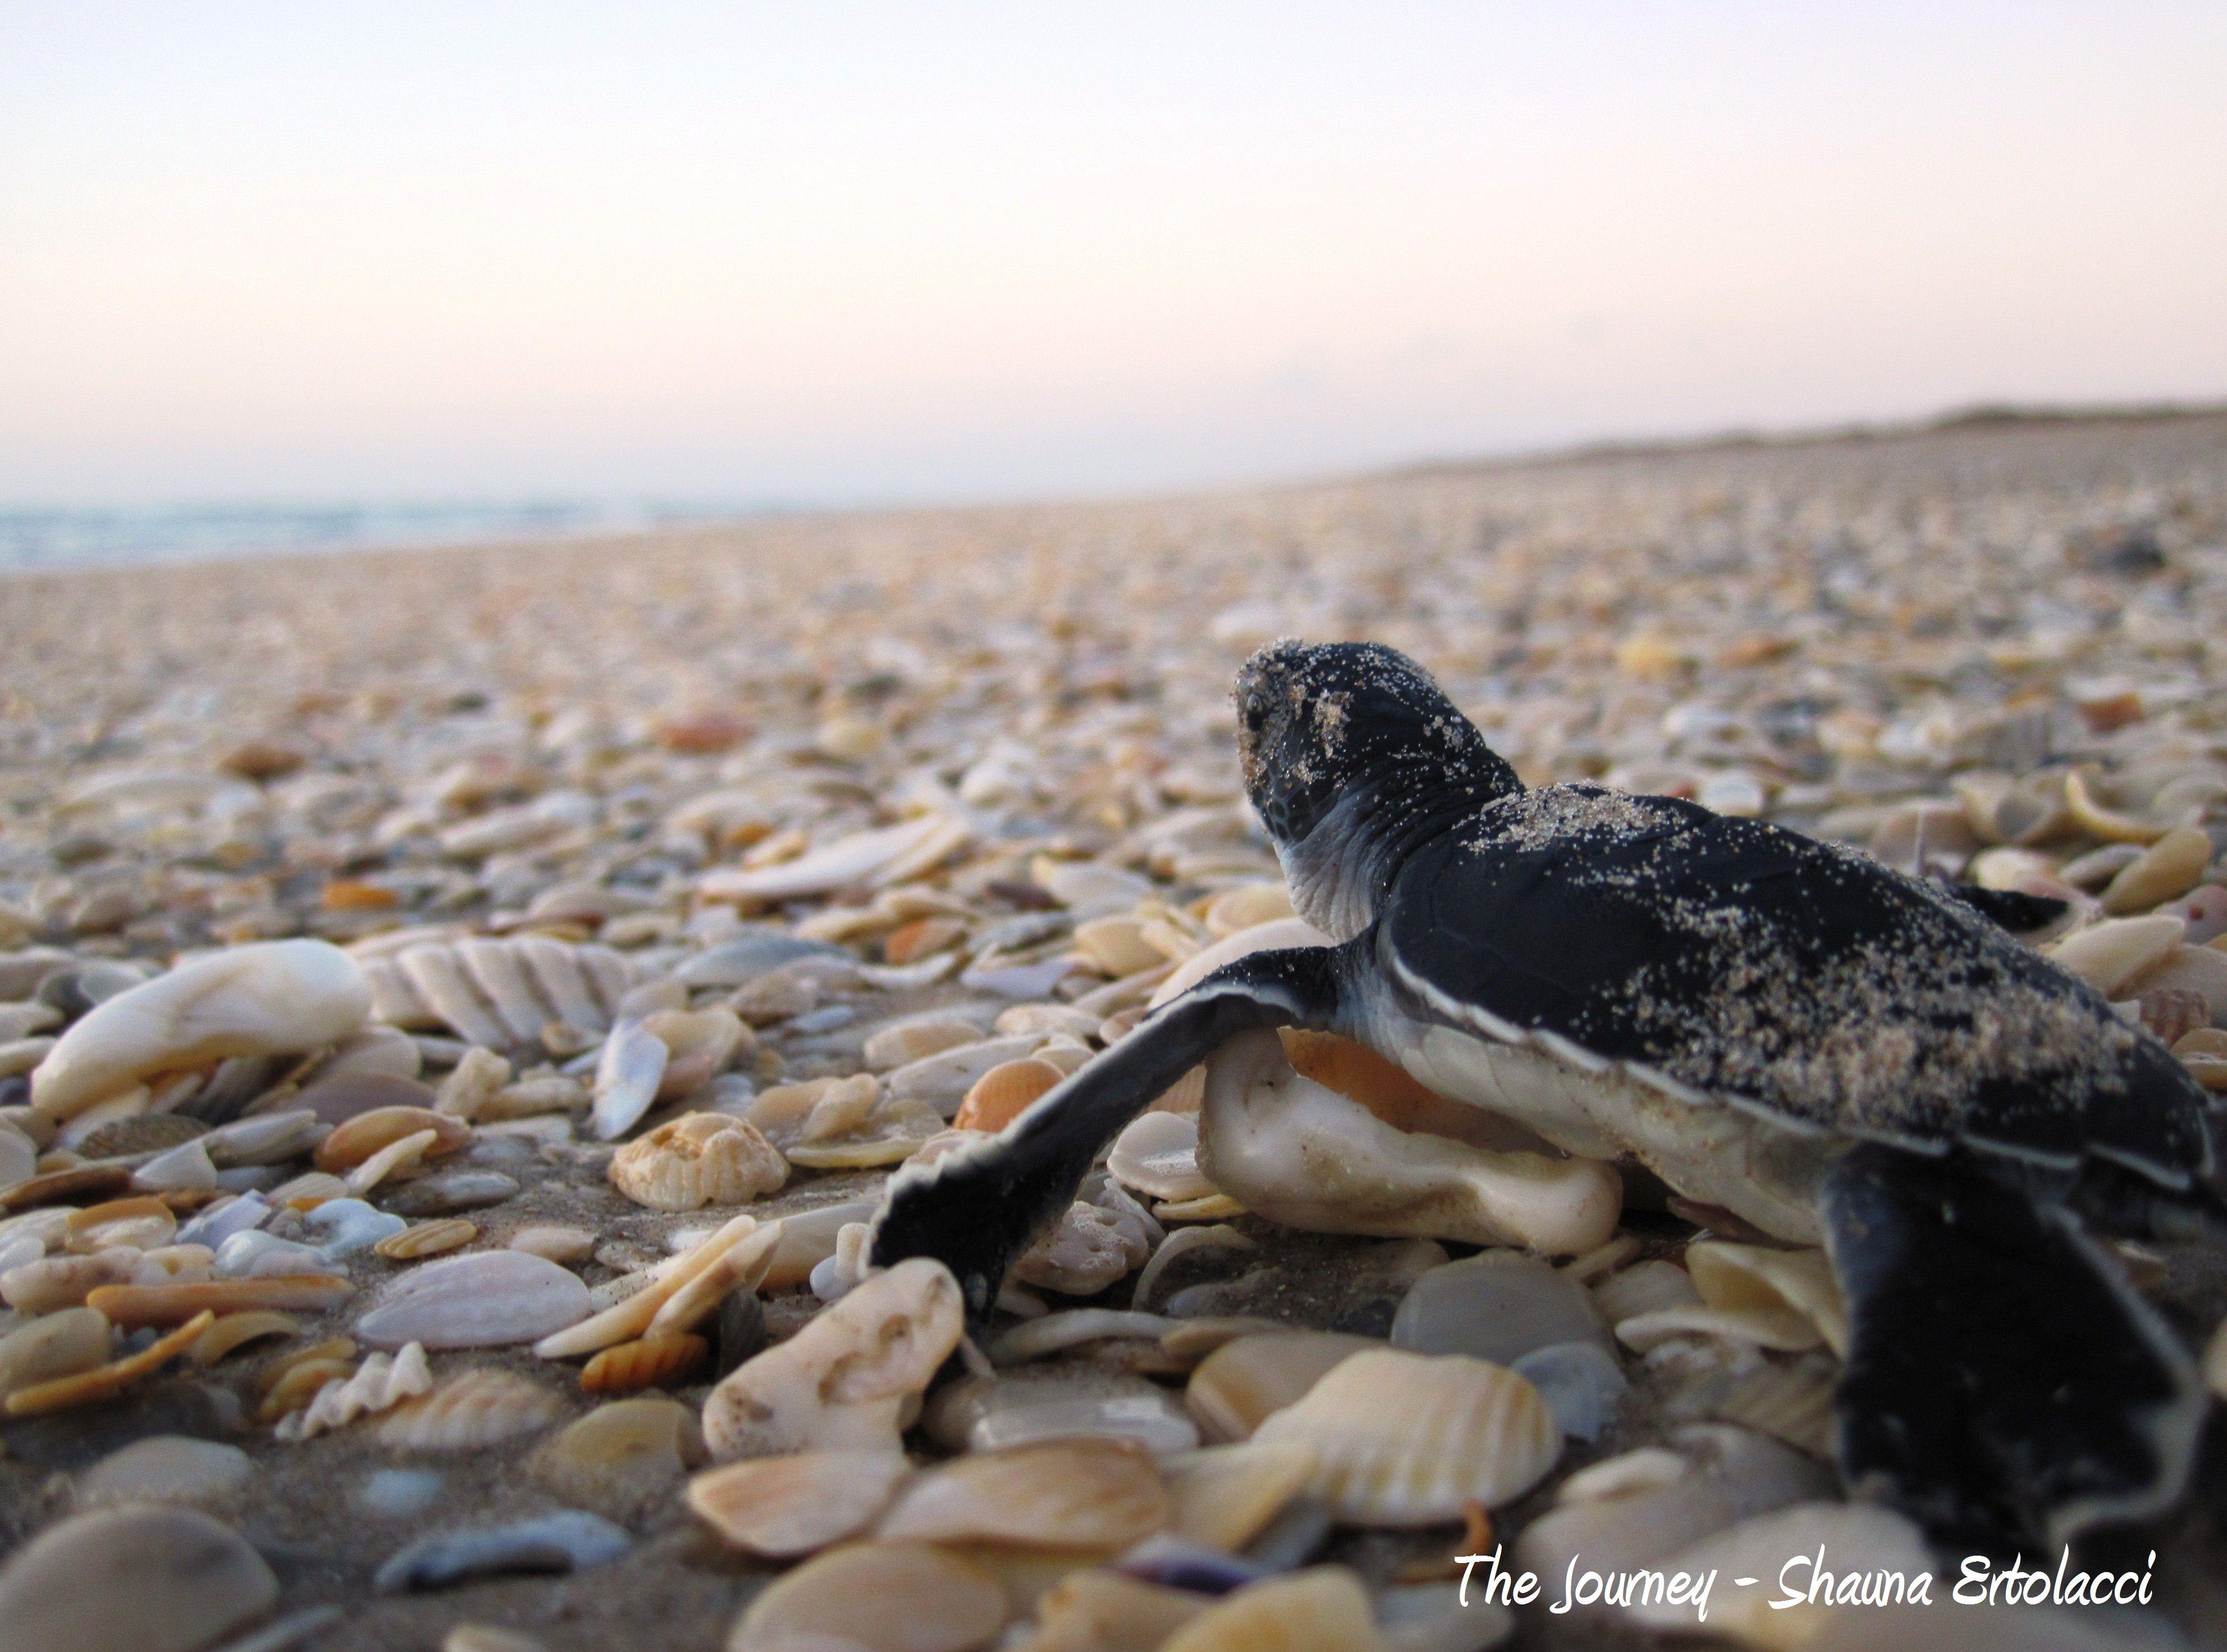 The journey, NPS photo by Shauna Ertolacci